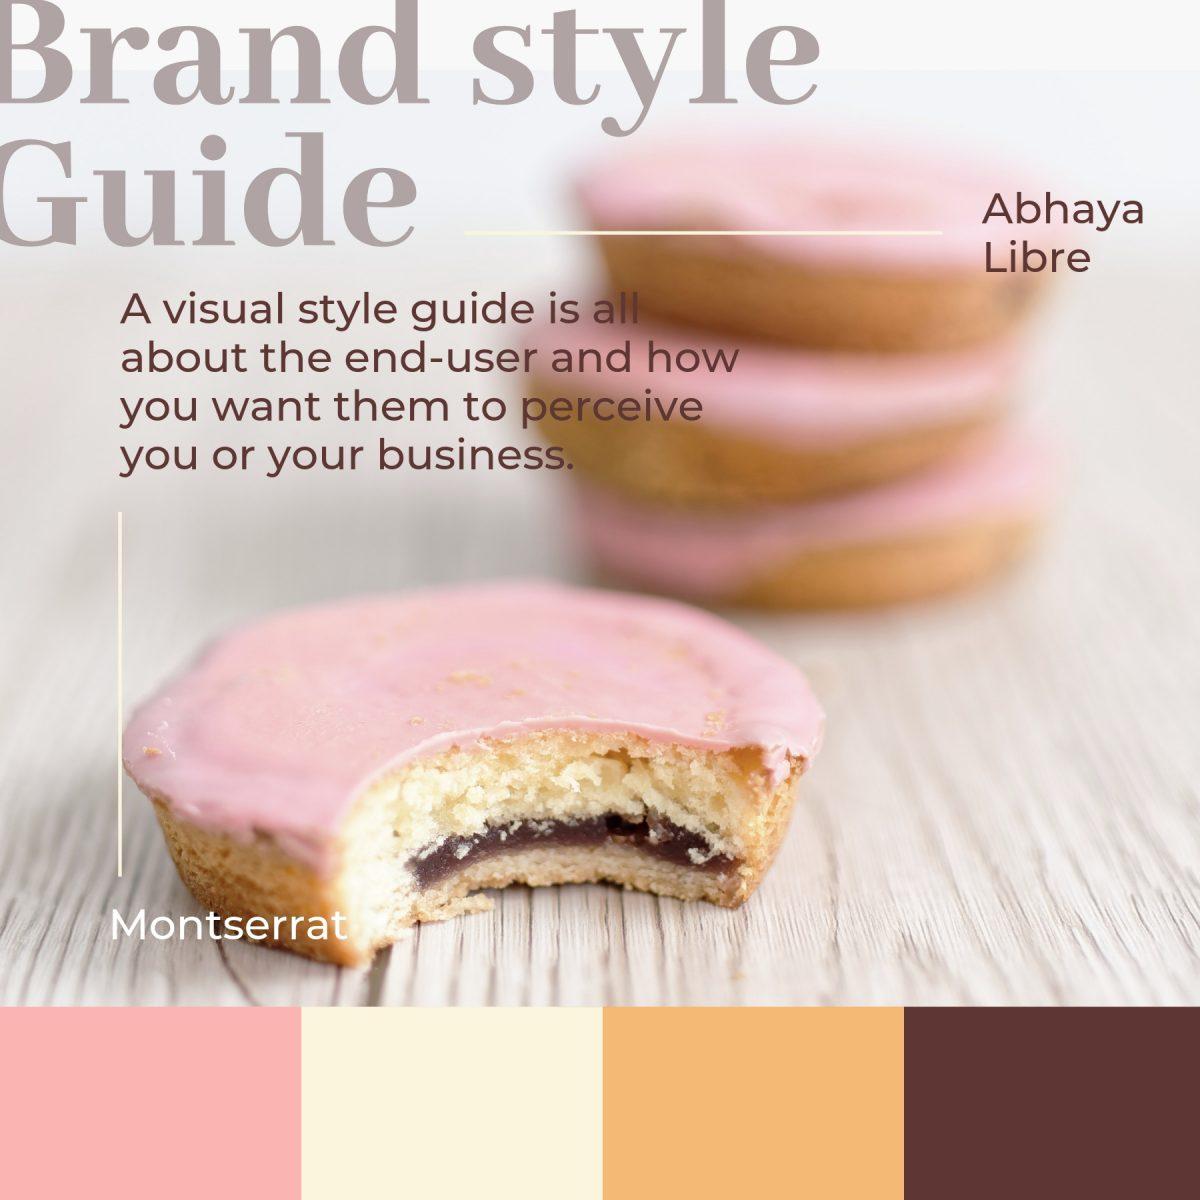 A step by step guide to visual branding for the non-designer - The Side Blogger #blogging #branding #designtips #design #bloggingtips